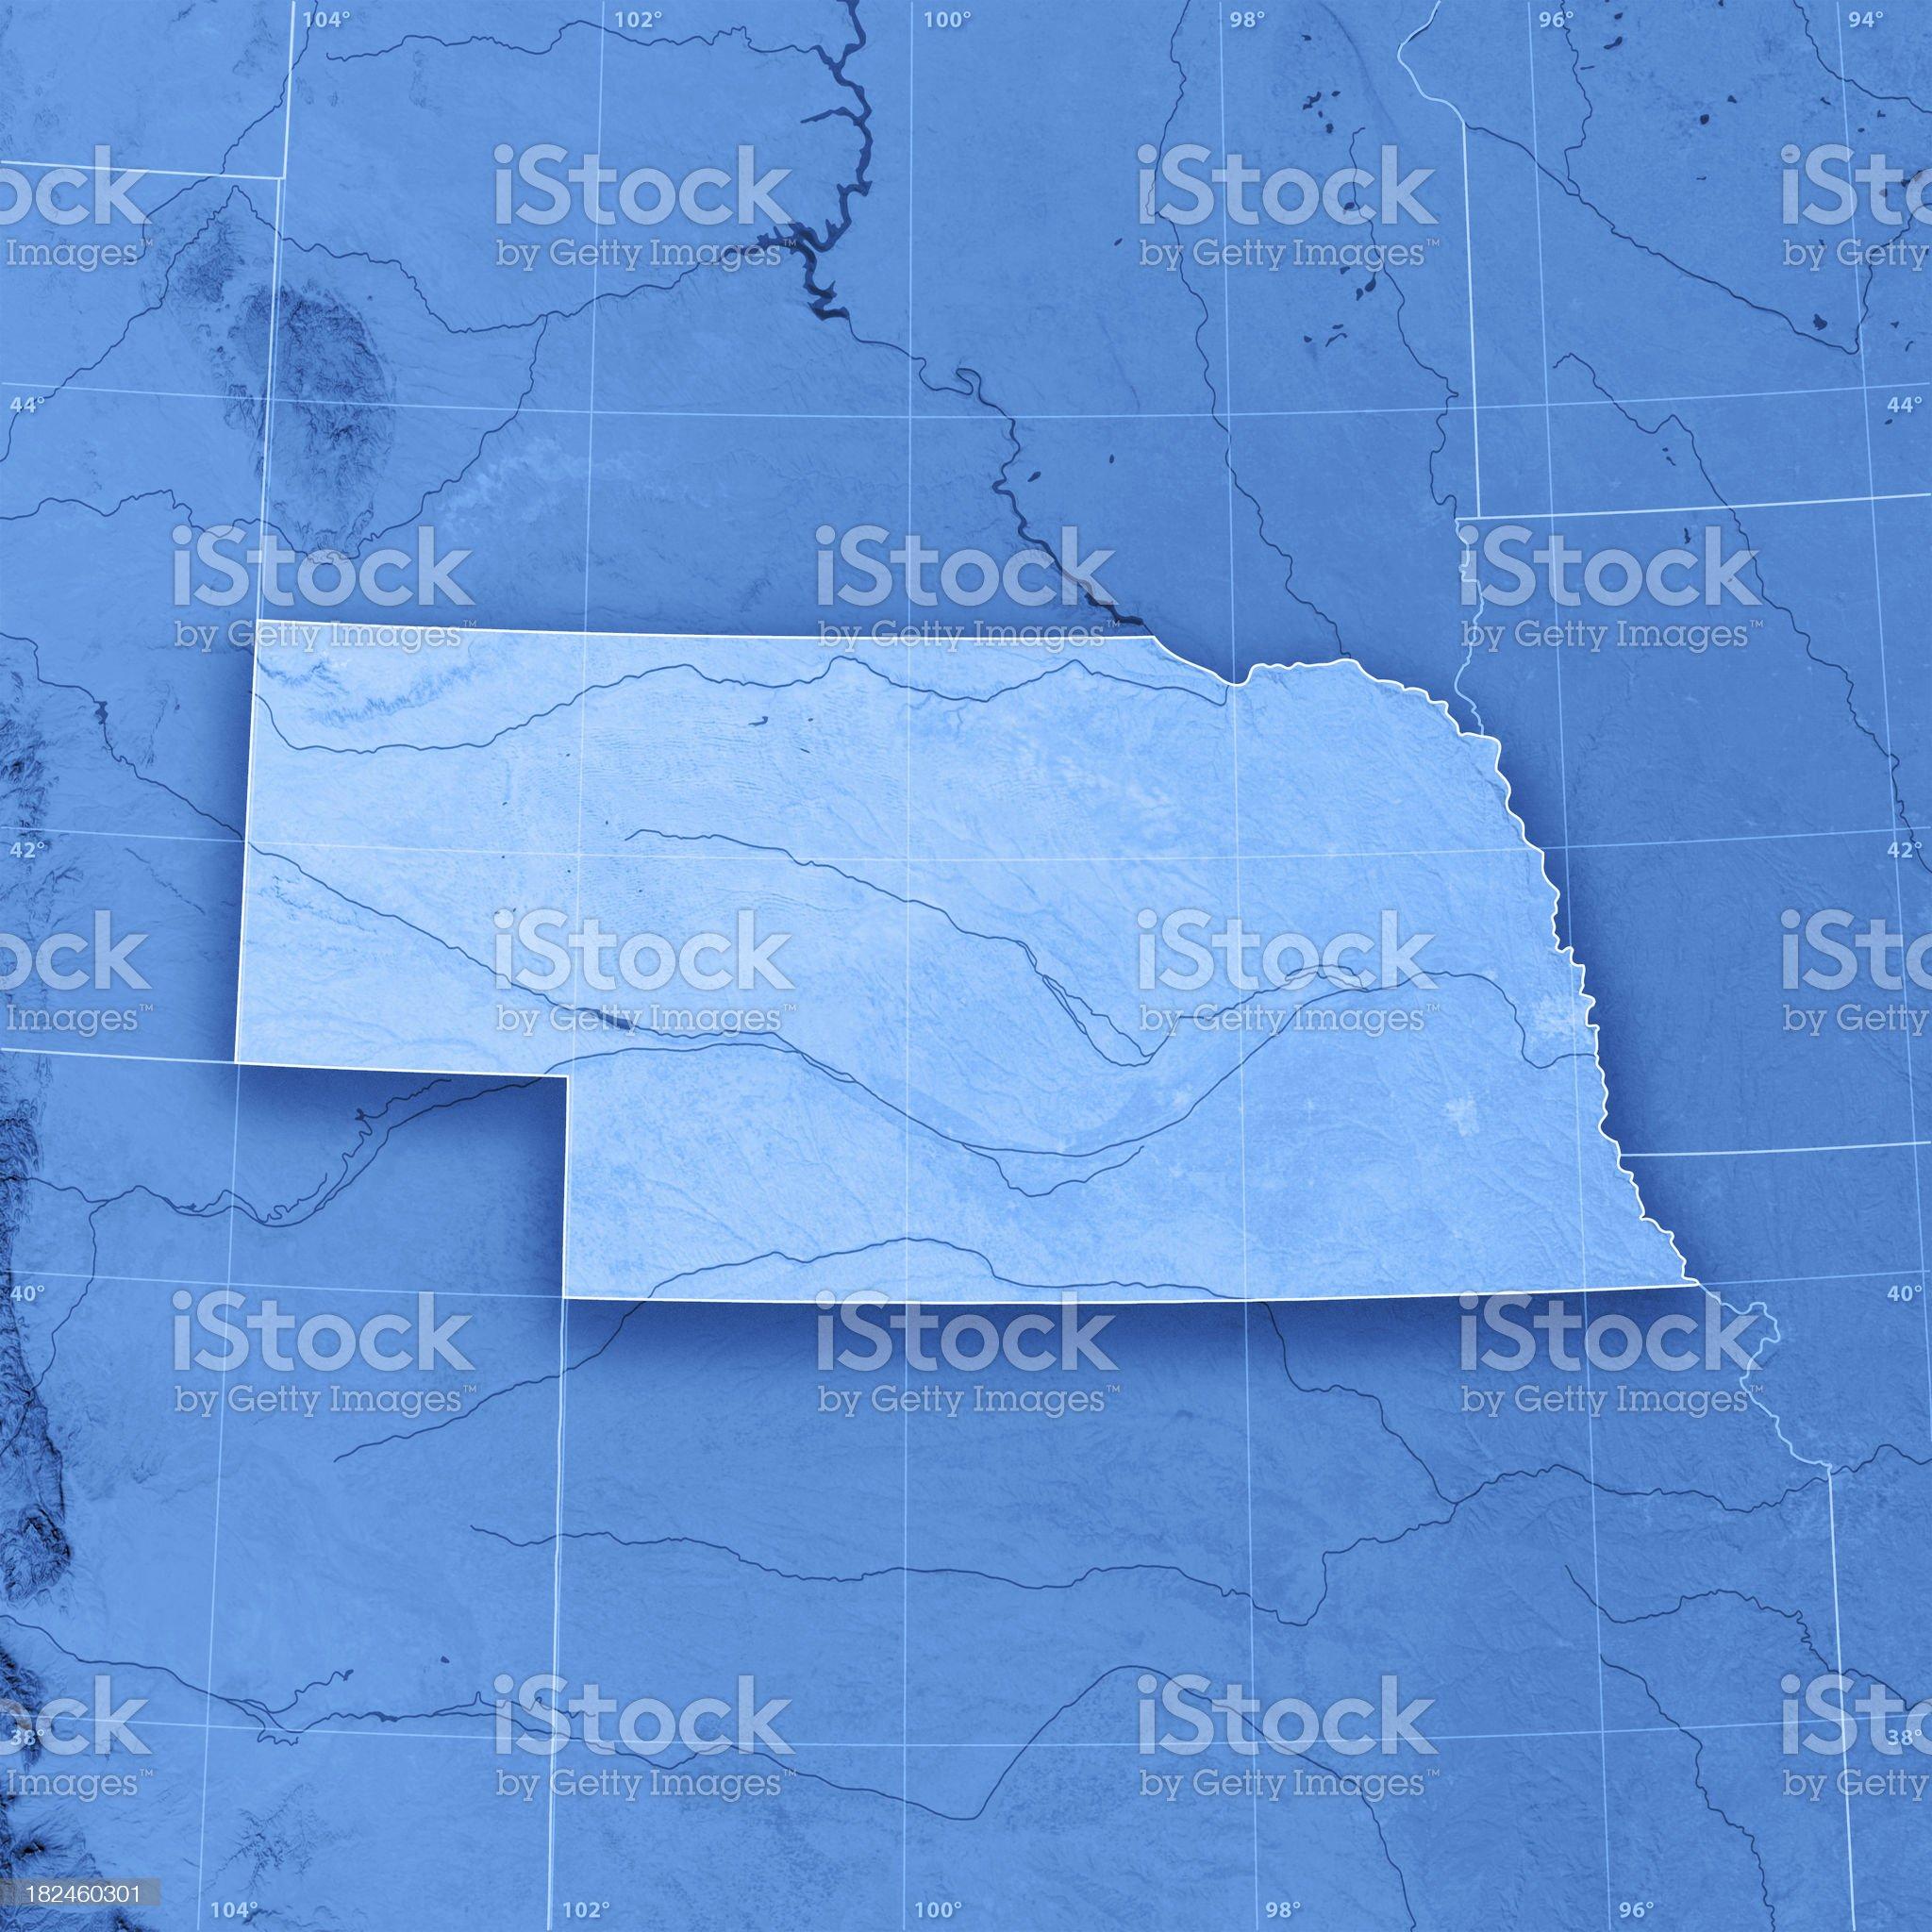 Nebraska Topographic Map royalty-free stock photo